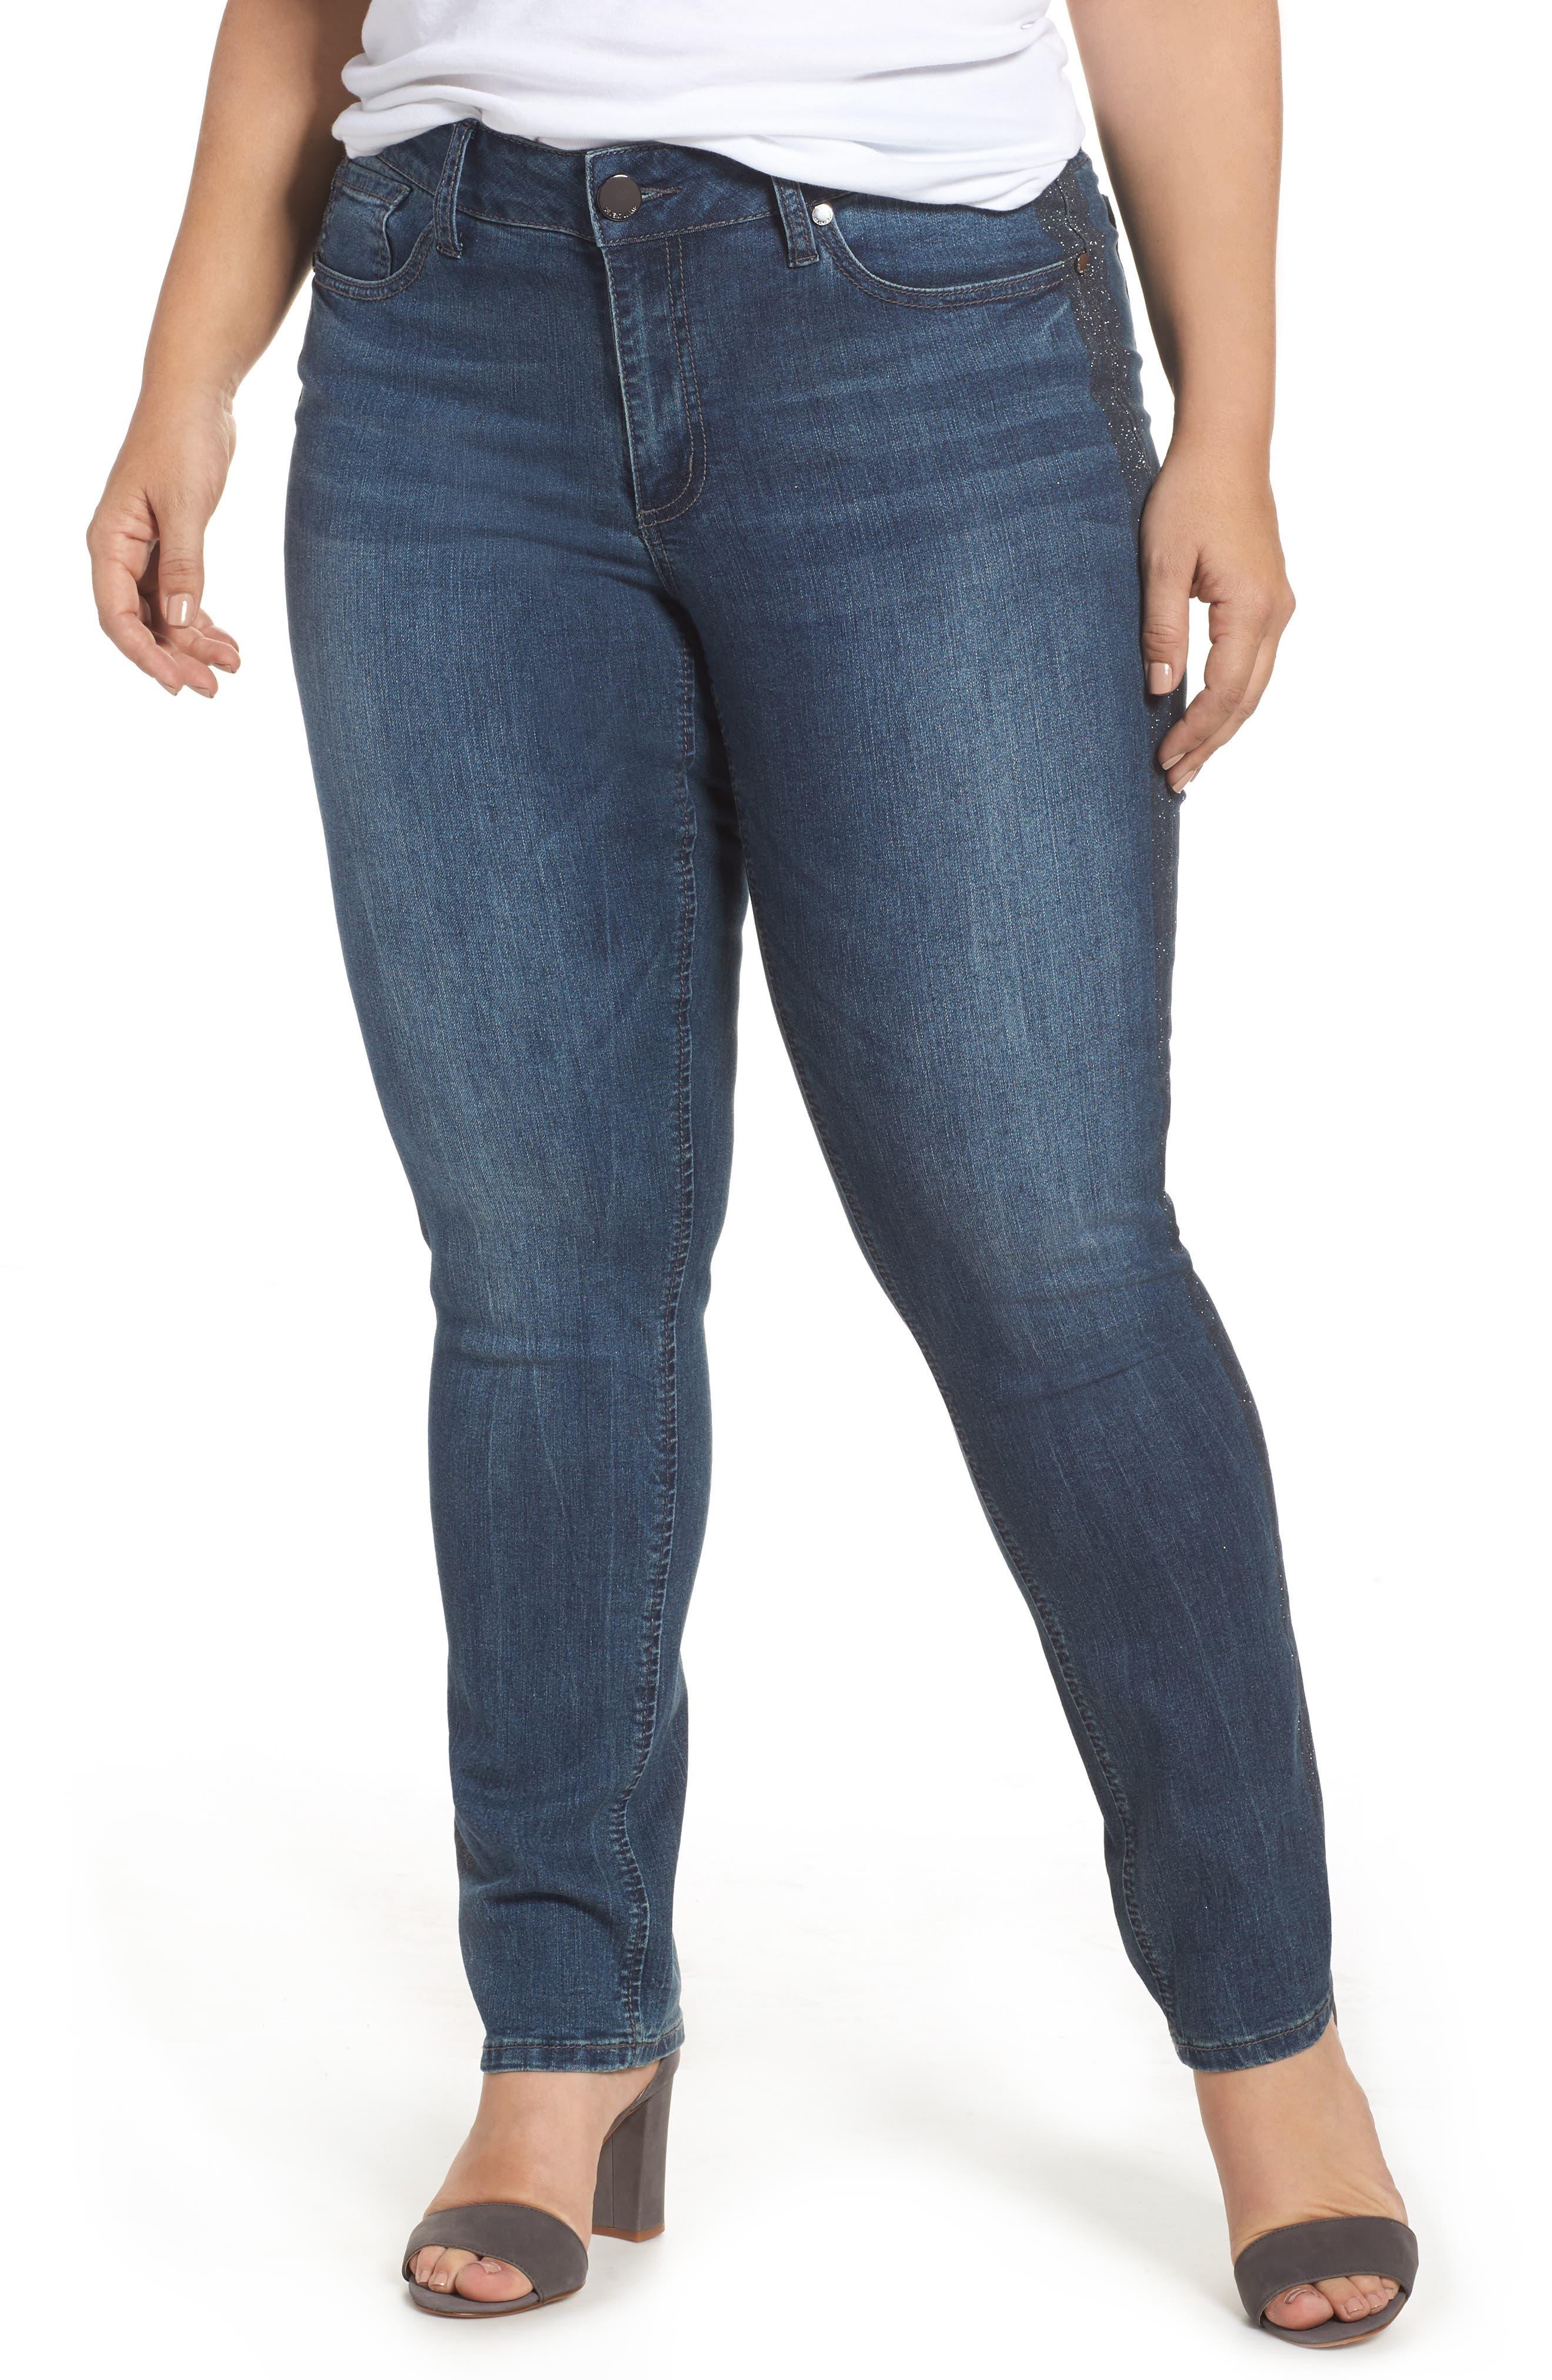 Seven7 Printed Foil Tuxedo Stripe Skinny Jeans (Locke) (Plus Size)